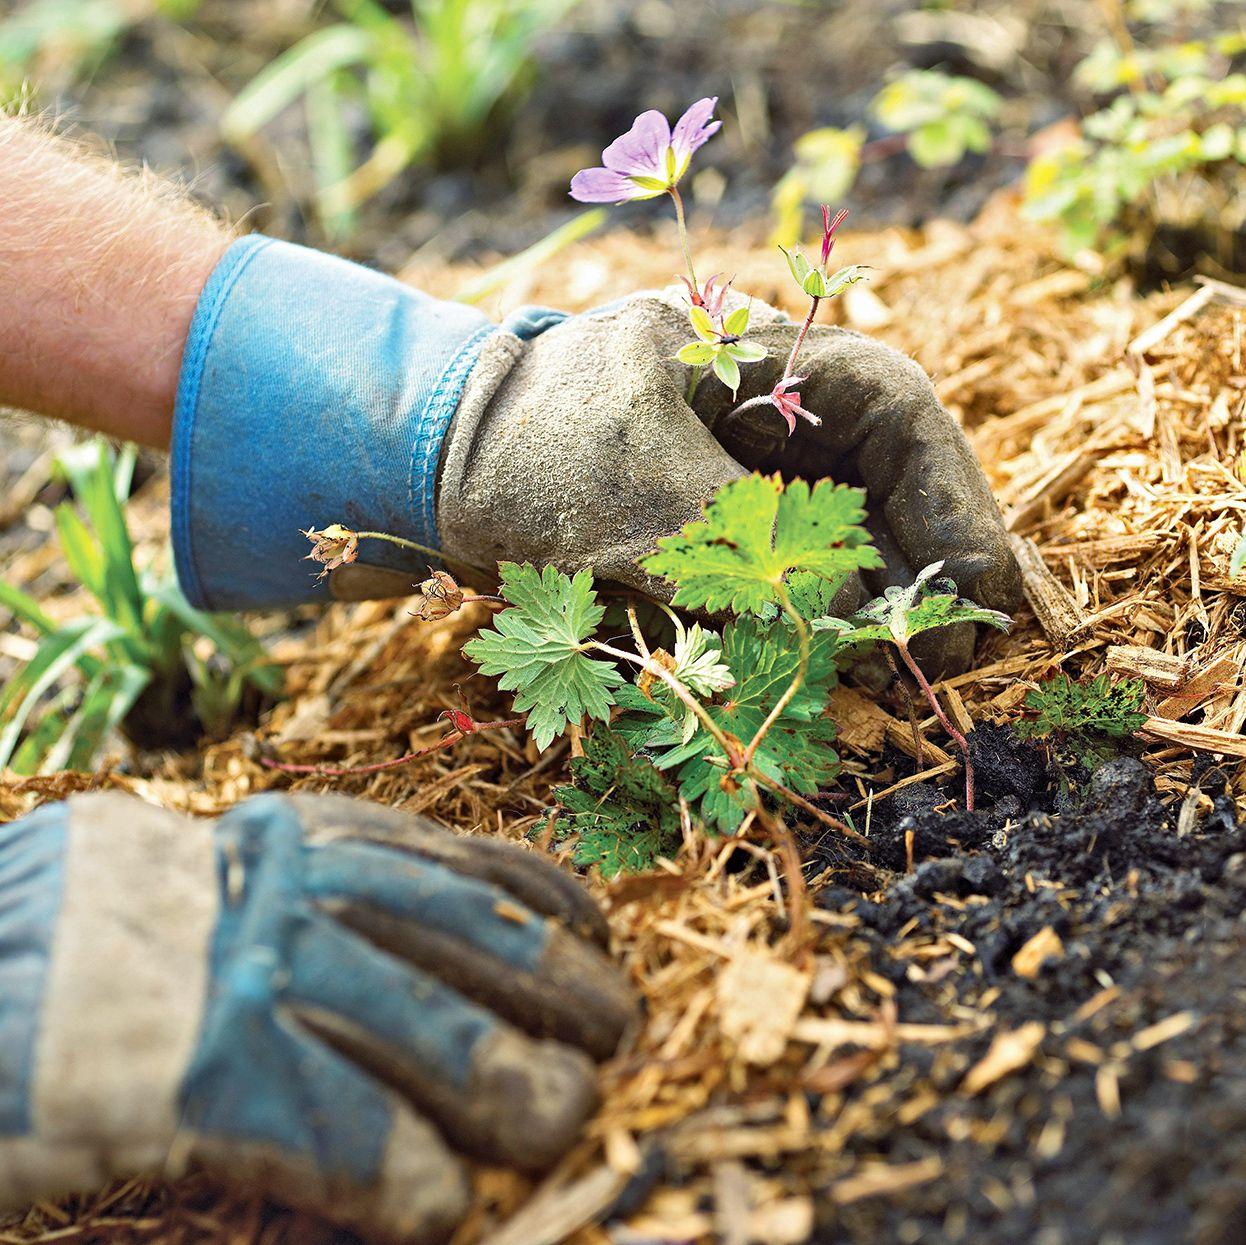 Not Mulching the Soil